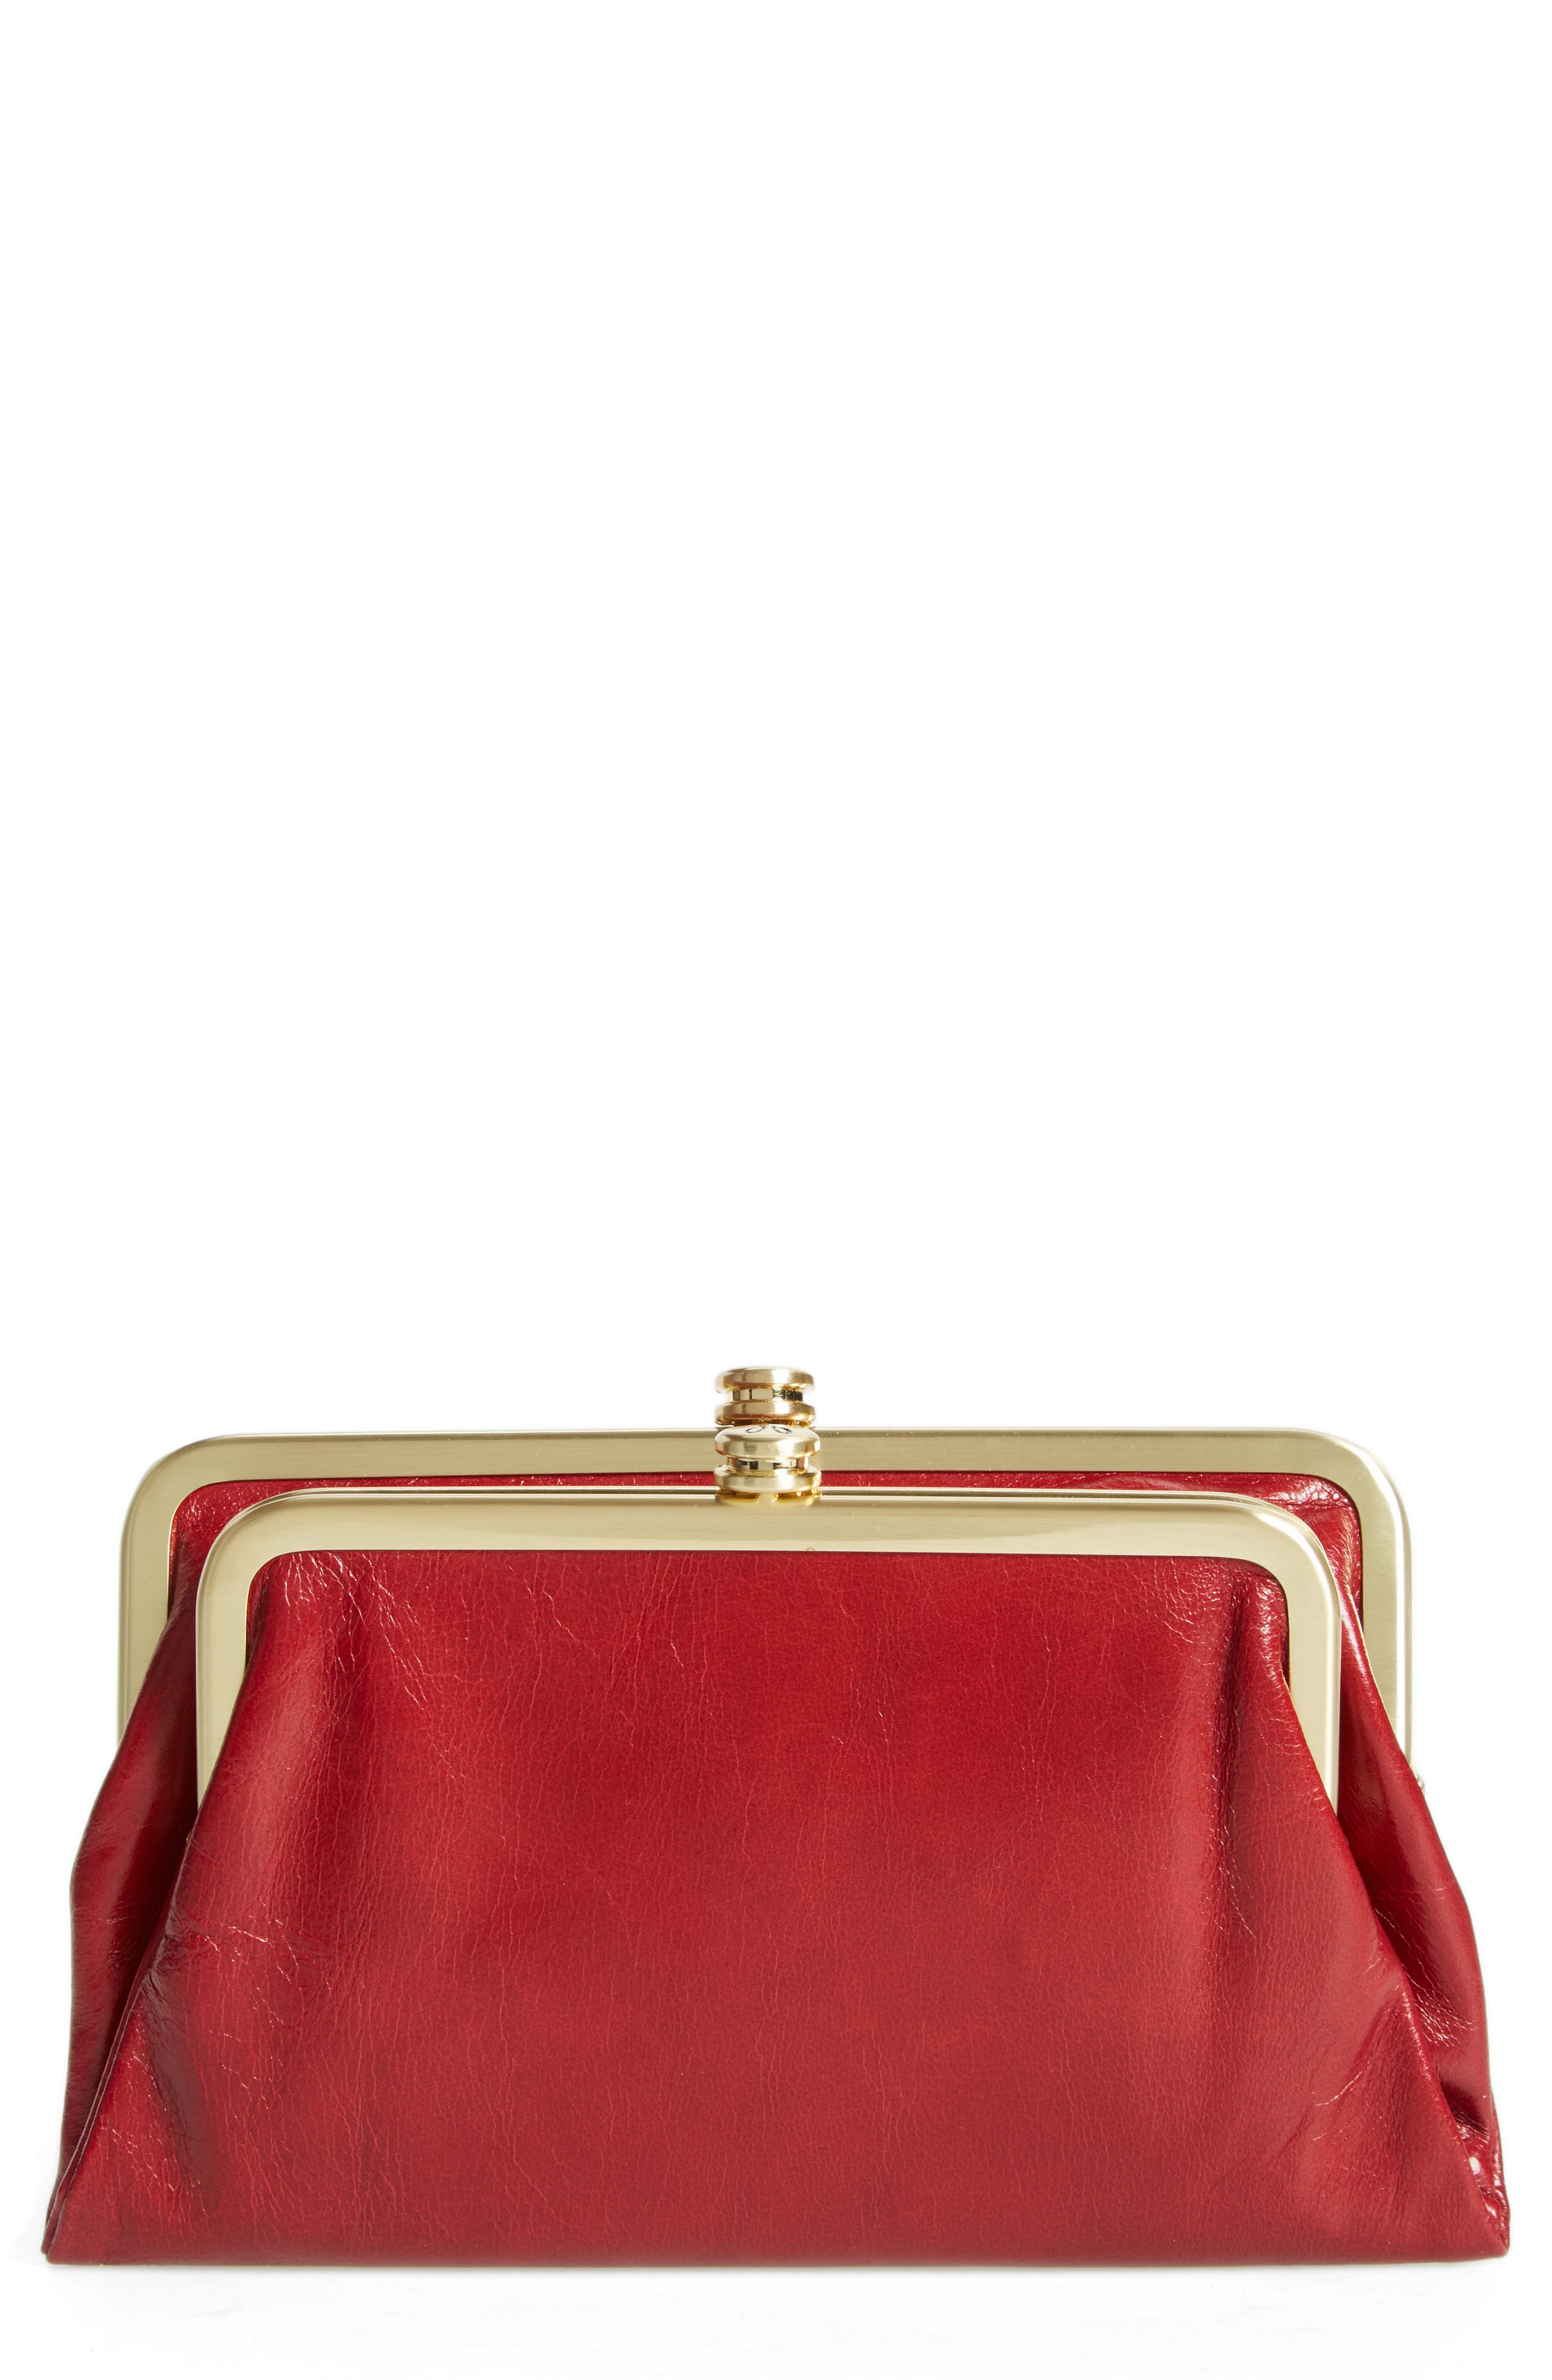 Suzette Calfskin Leather Wallet,                         Main,                         color, Cardinal